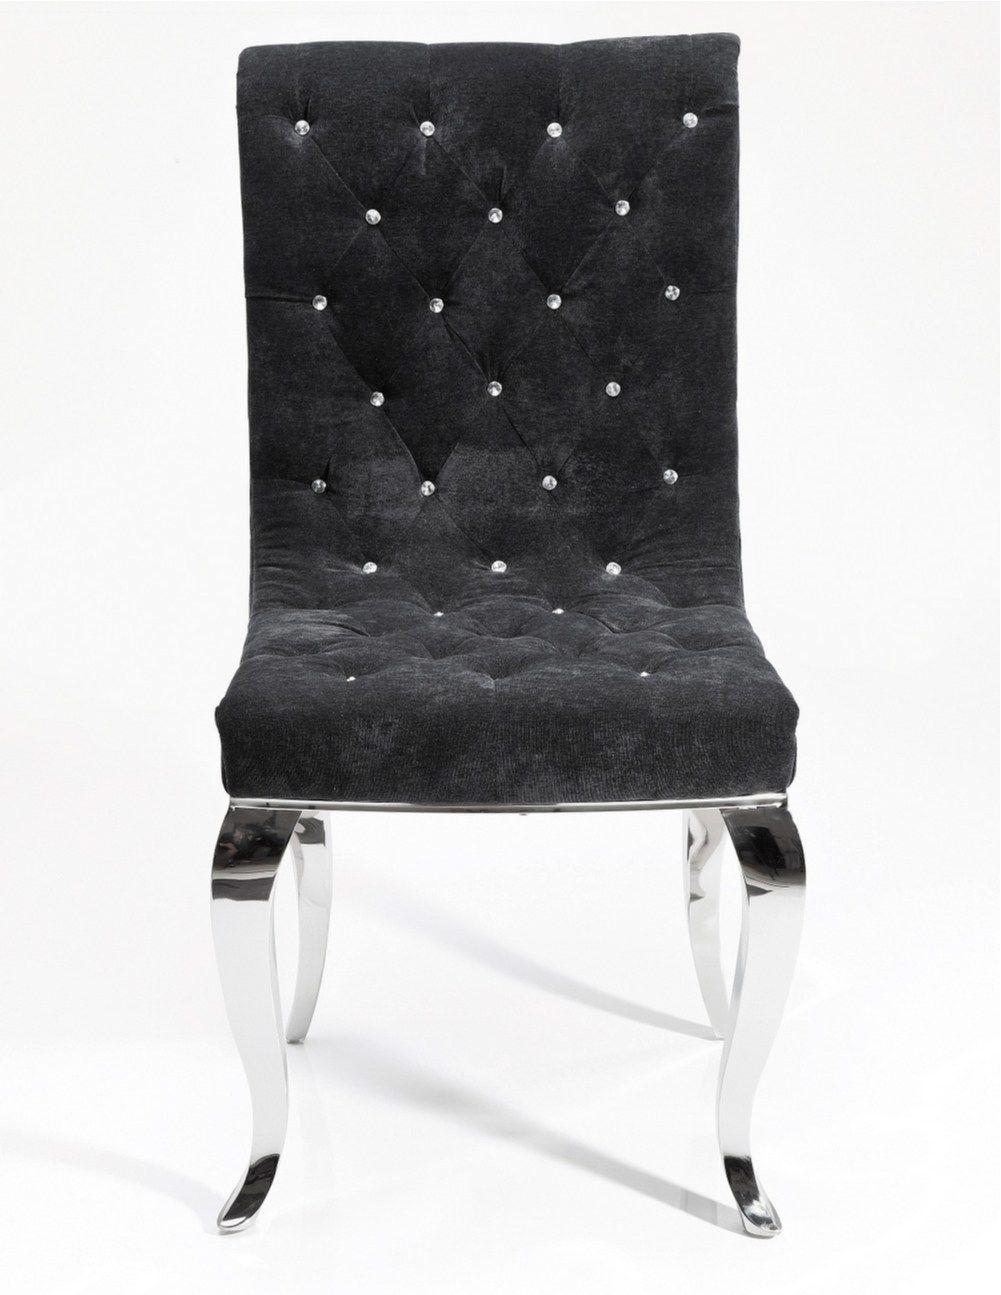 Sedia capitonn in tessuto bijou steel sedia kare design for Kare design tisch bijou steel